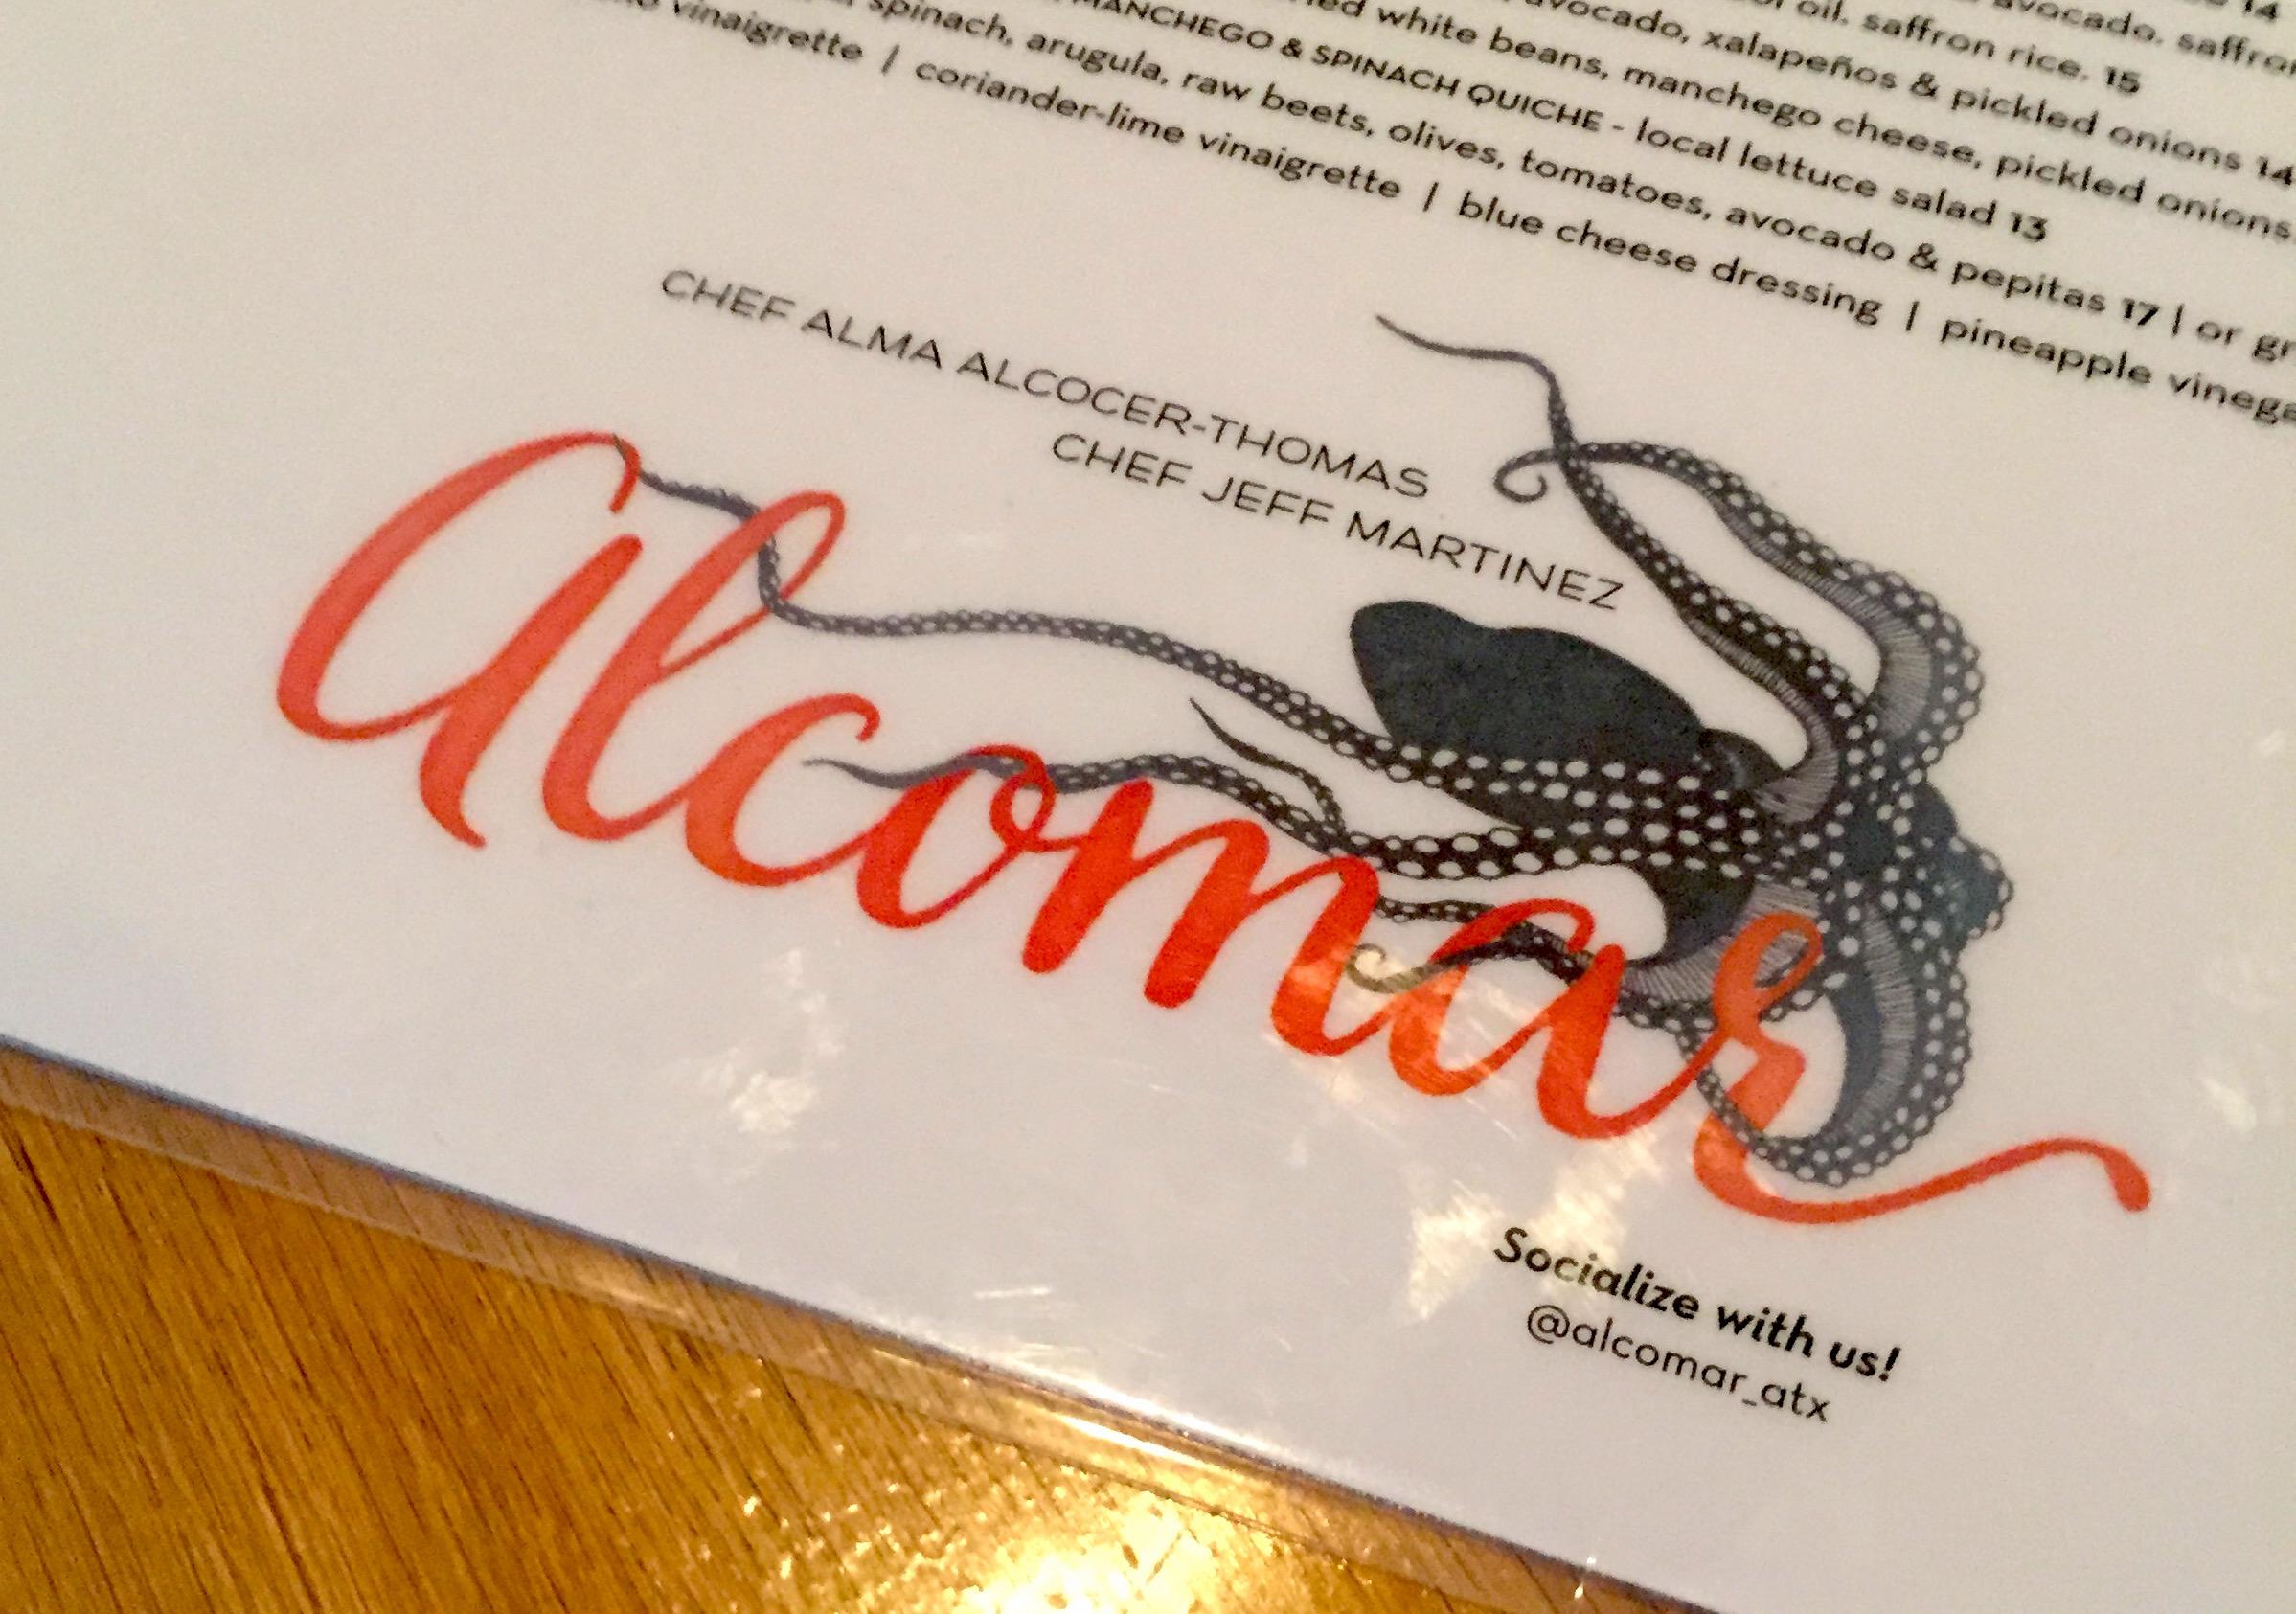 Alcomar menu snapshot